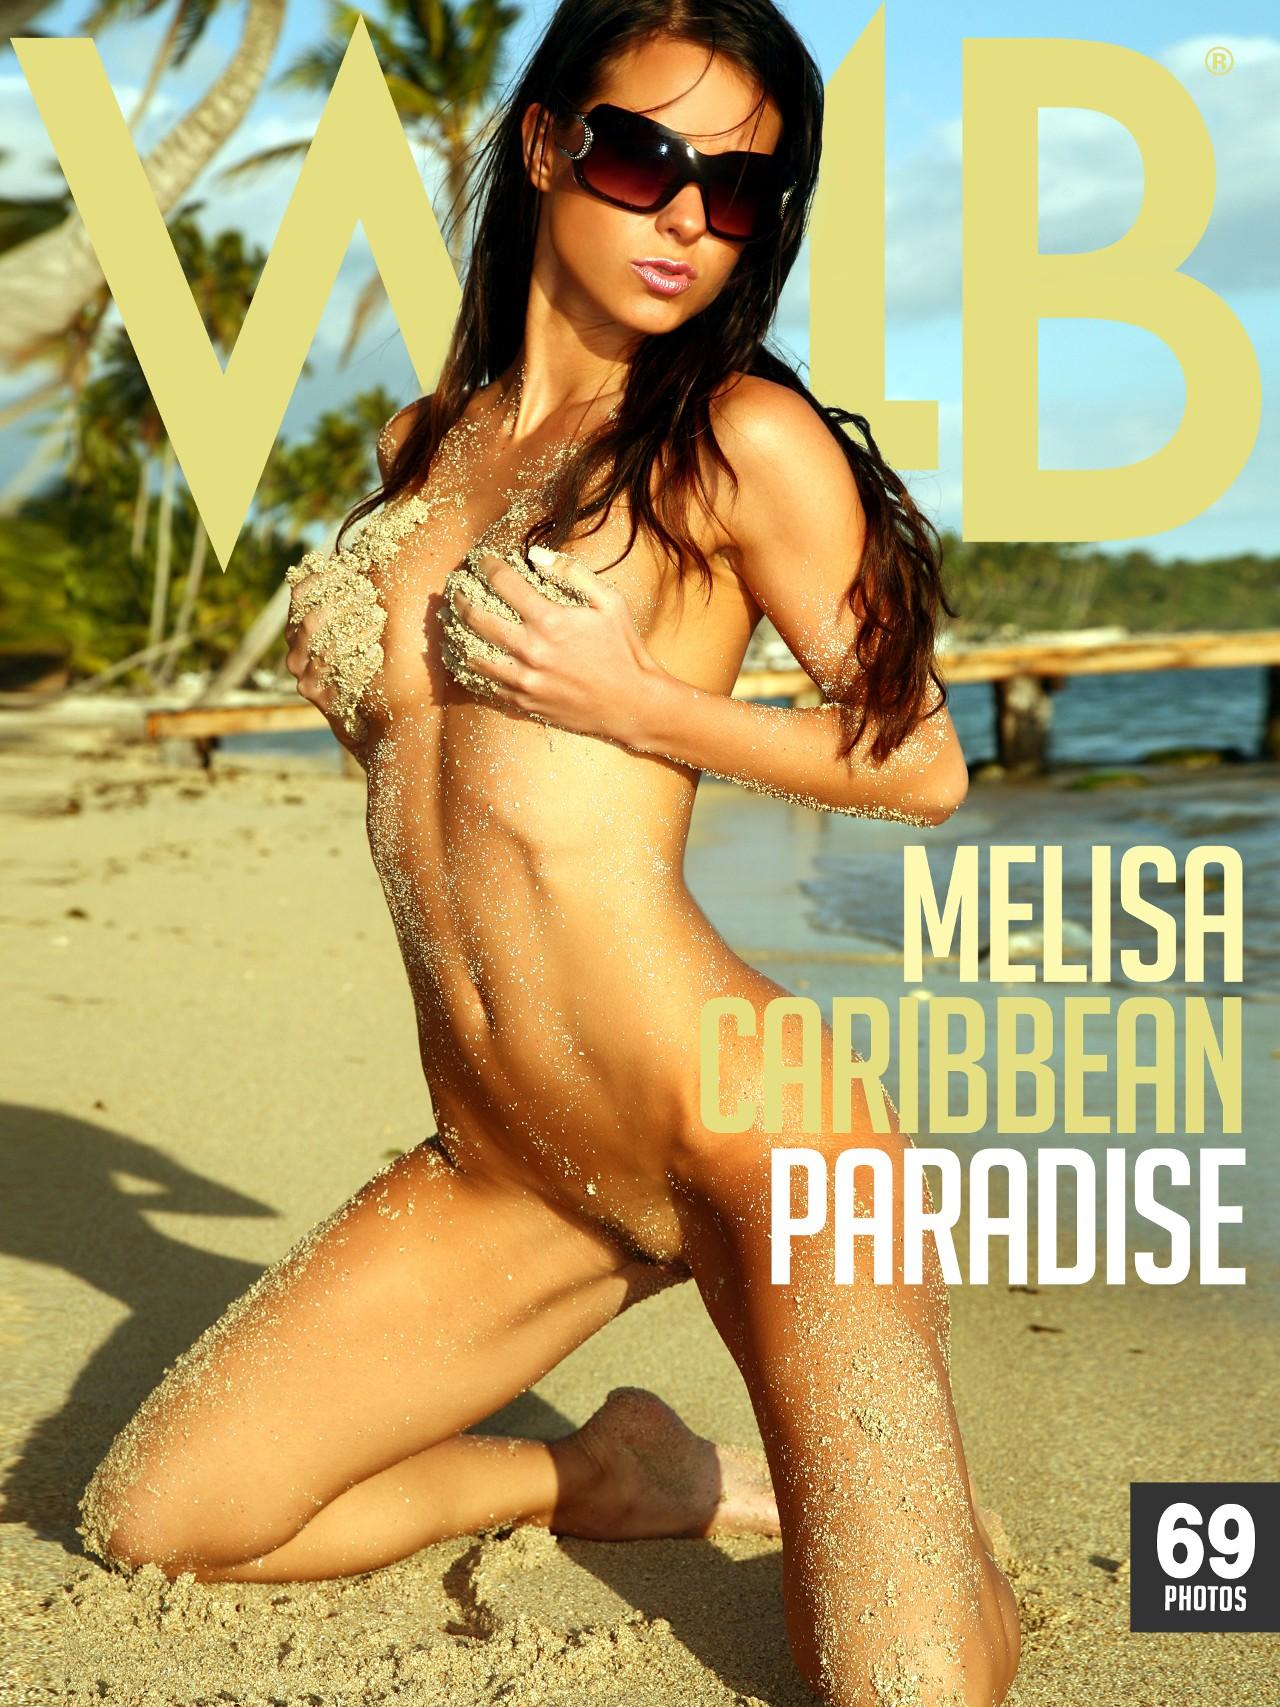 Melisa: Caribbean paradise